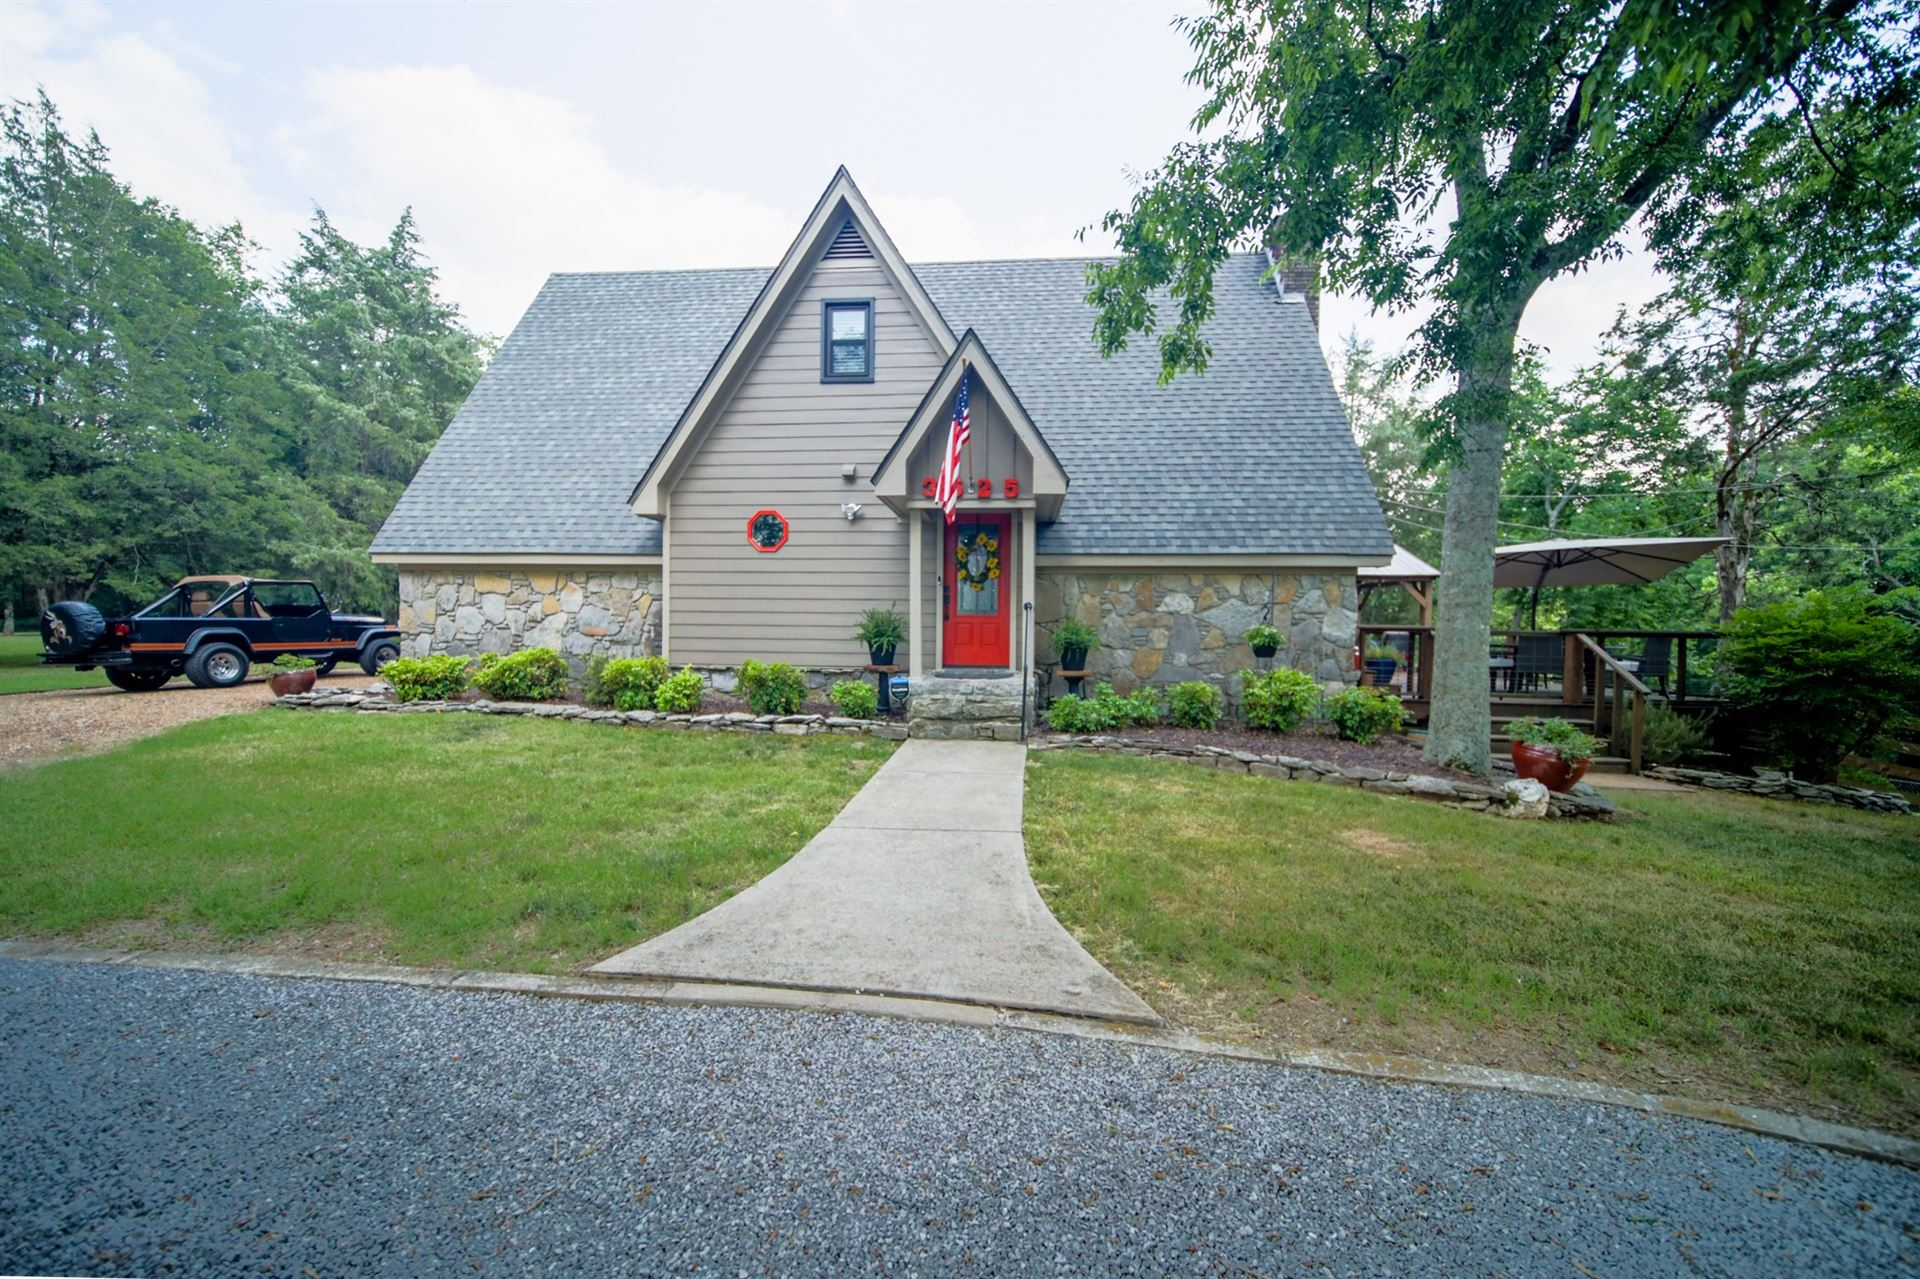 3525 Shacklett Rd, Murfreesboro, TN 37129 - MLS#: 2263536